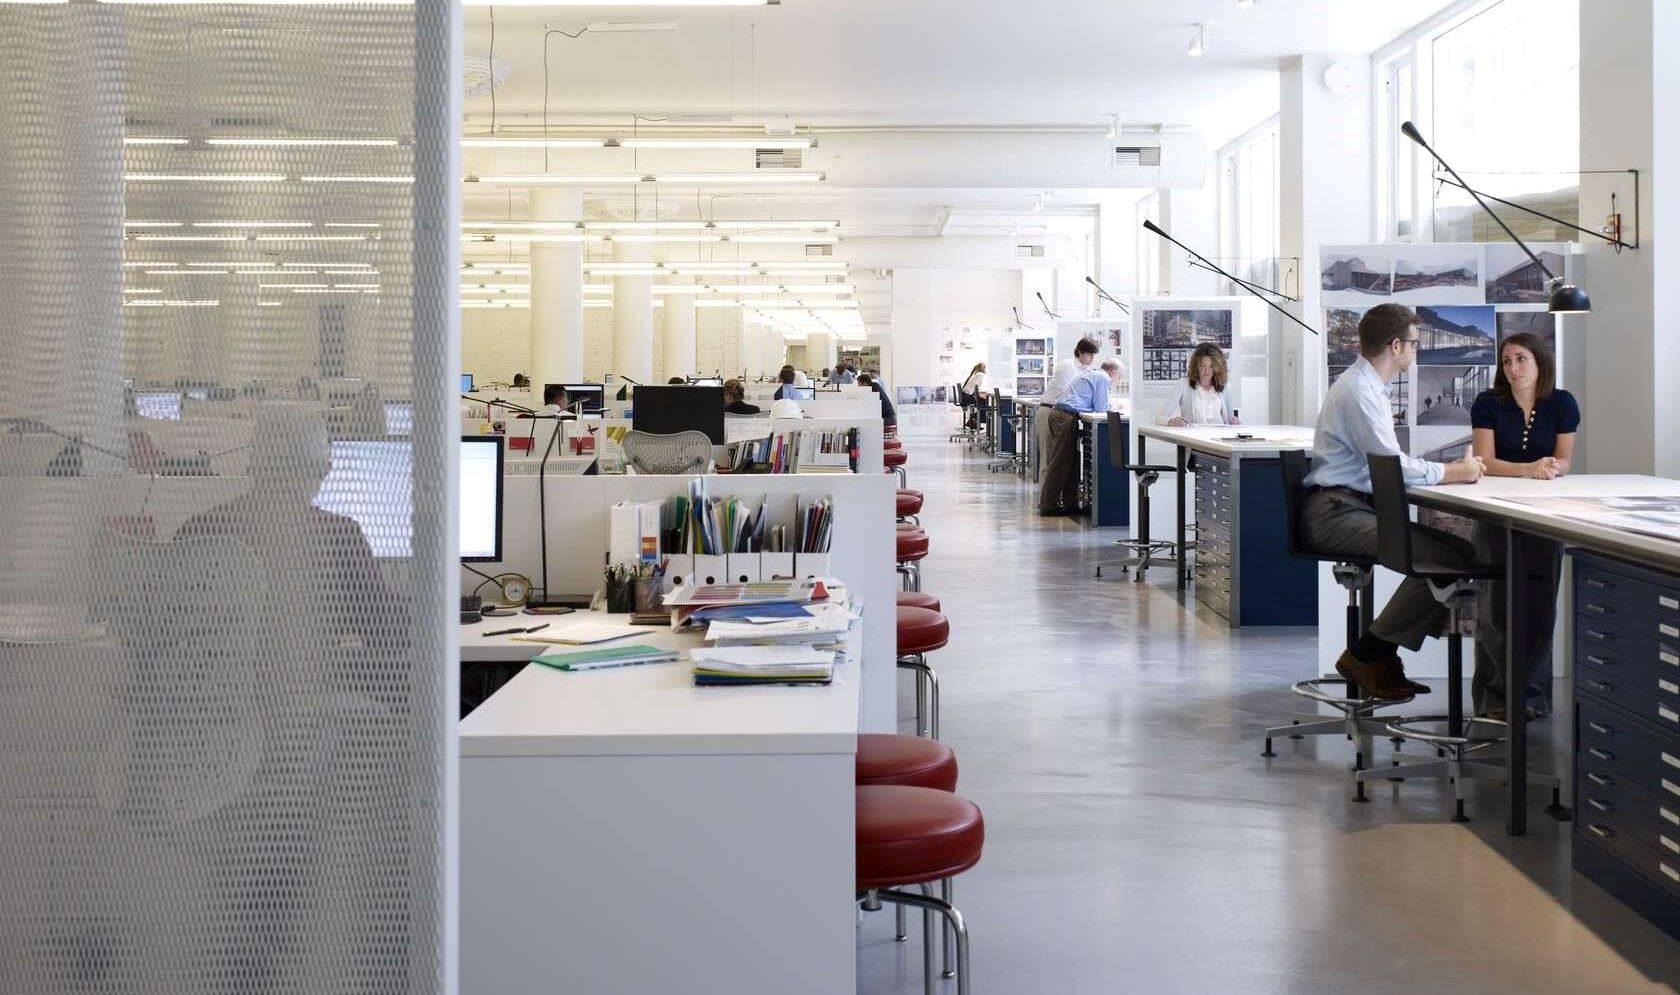 Gensler architects and designers work together in building design